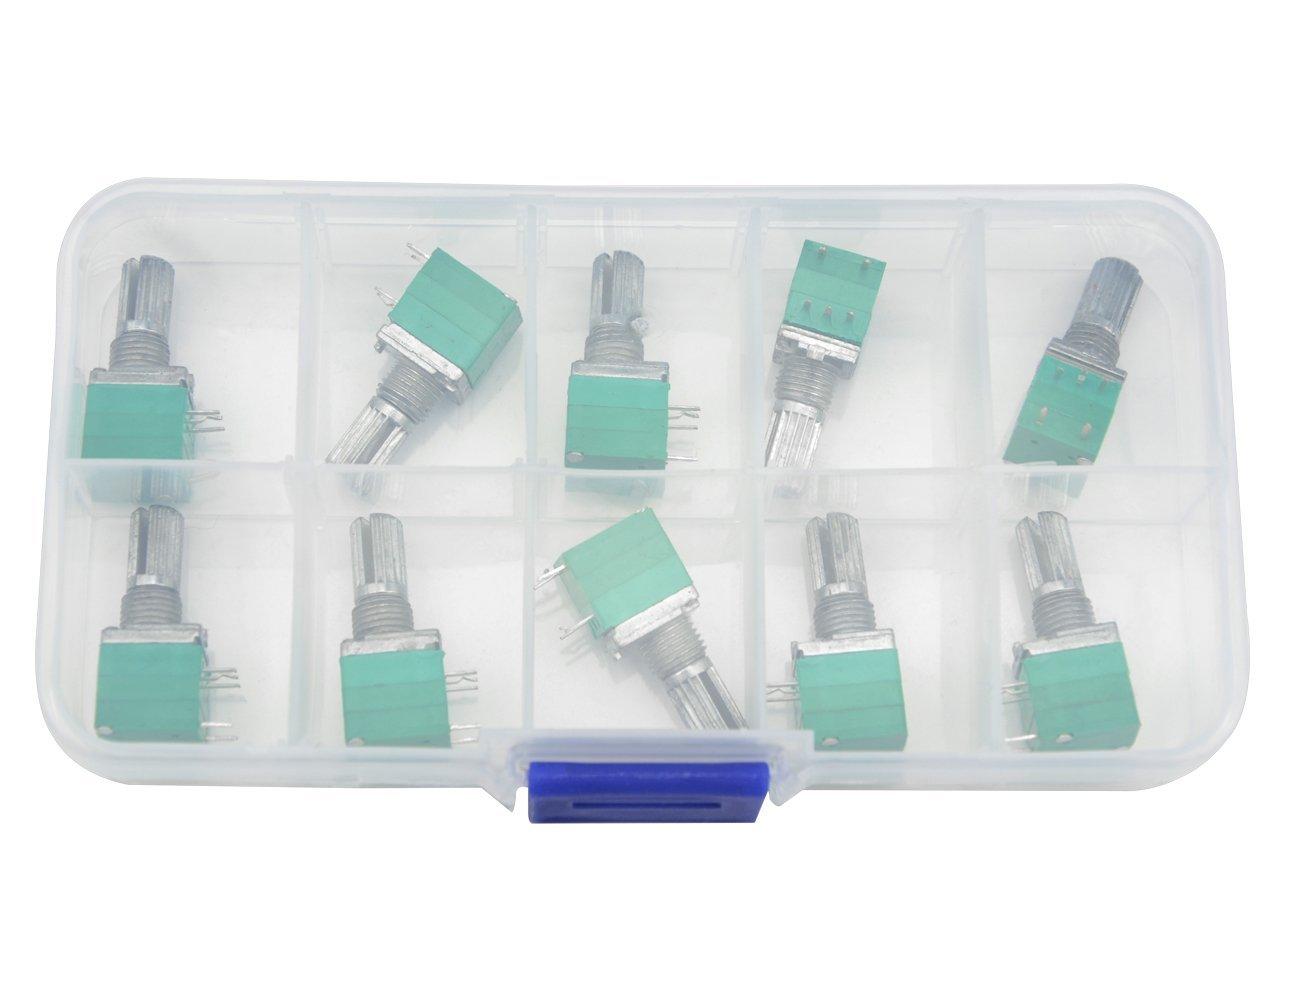 Cheap 25k Linear Potentiometer Find Deals Clarostat Wiring Get Quotations Wgcd 10 Pcs B50k 50k Ohm 5 Pin Terminal Single Rotary Taper